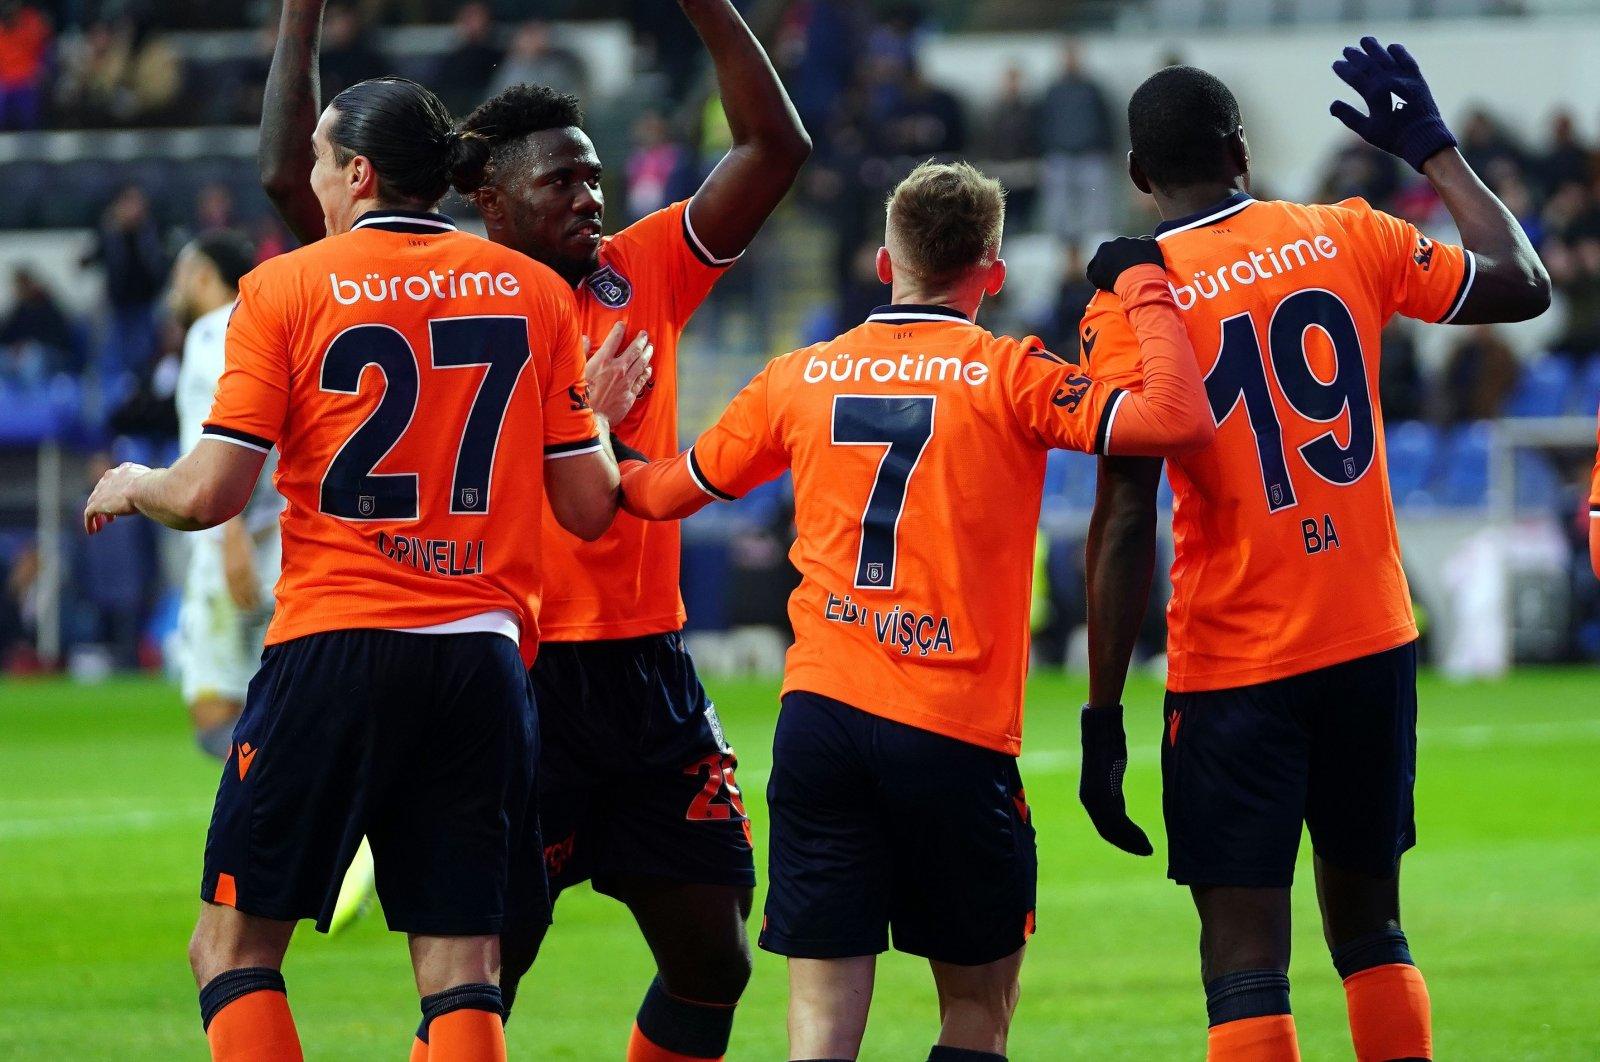 Crivelli, Ba and Visca celebrate after a goal. (İHA Photo)